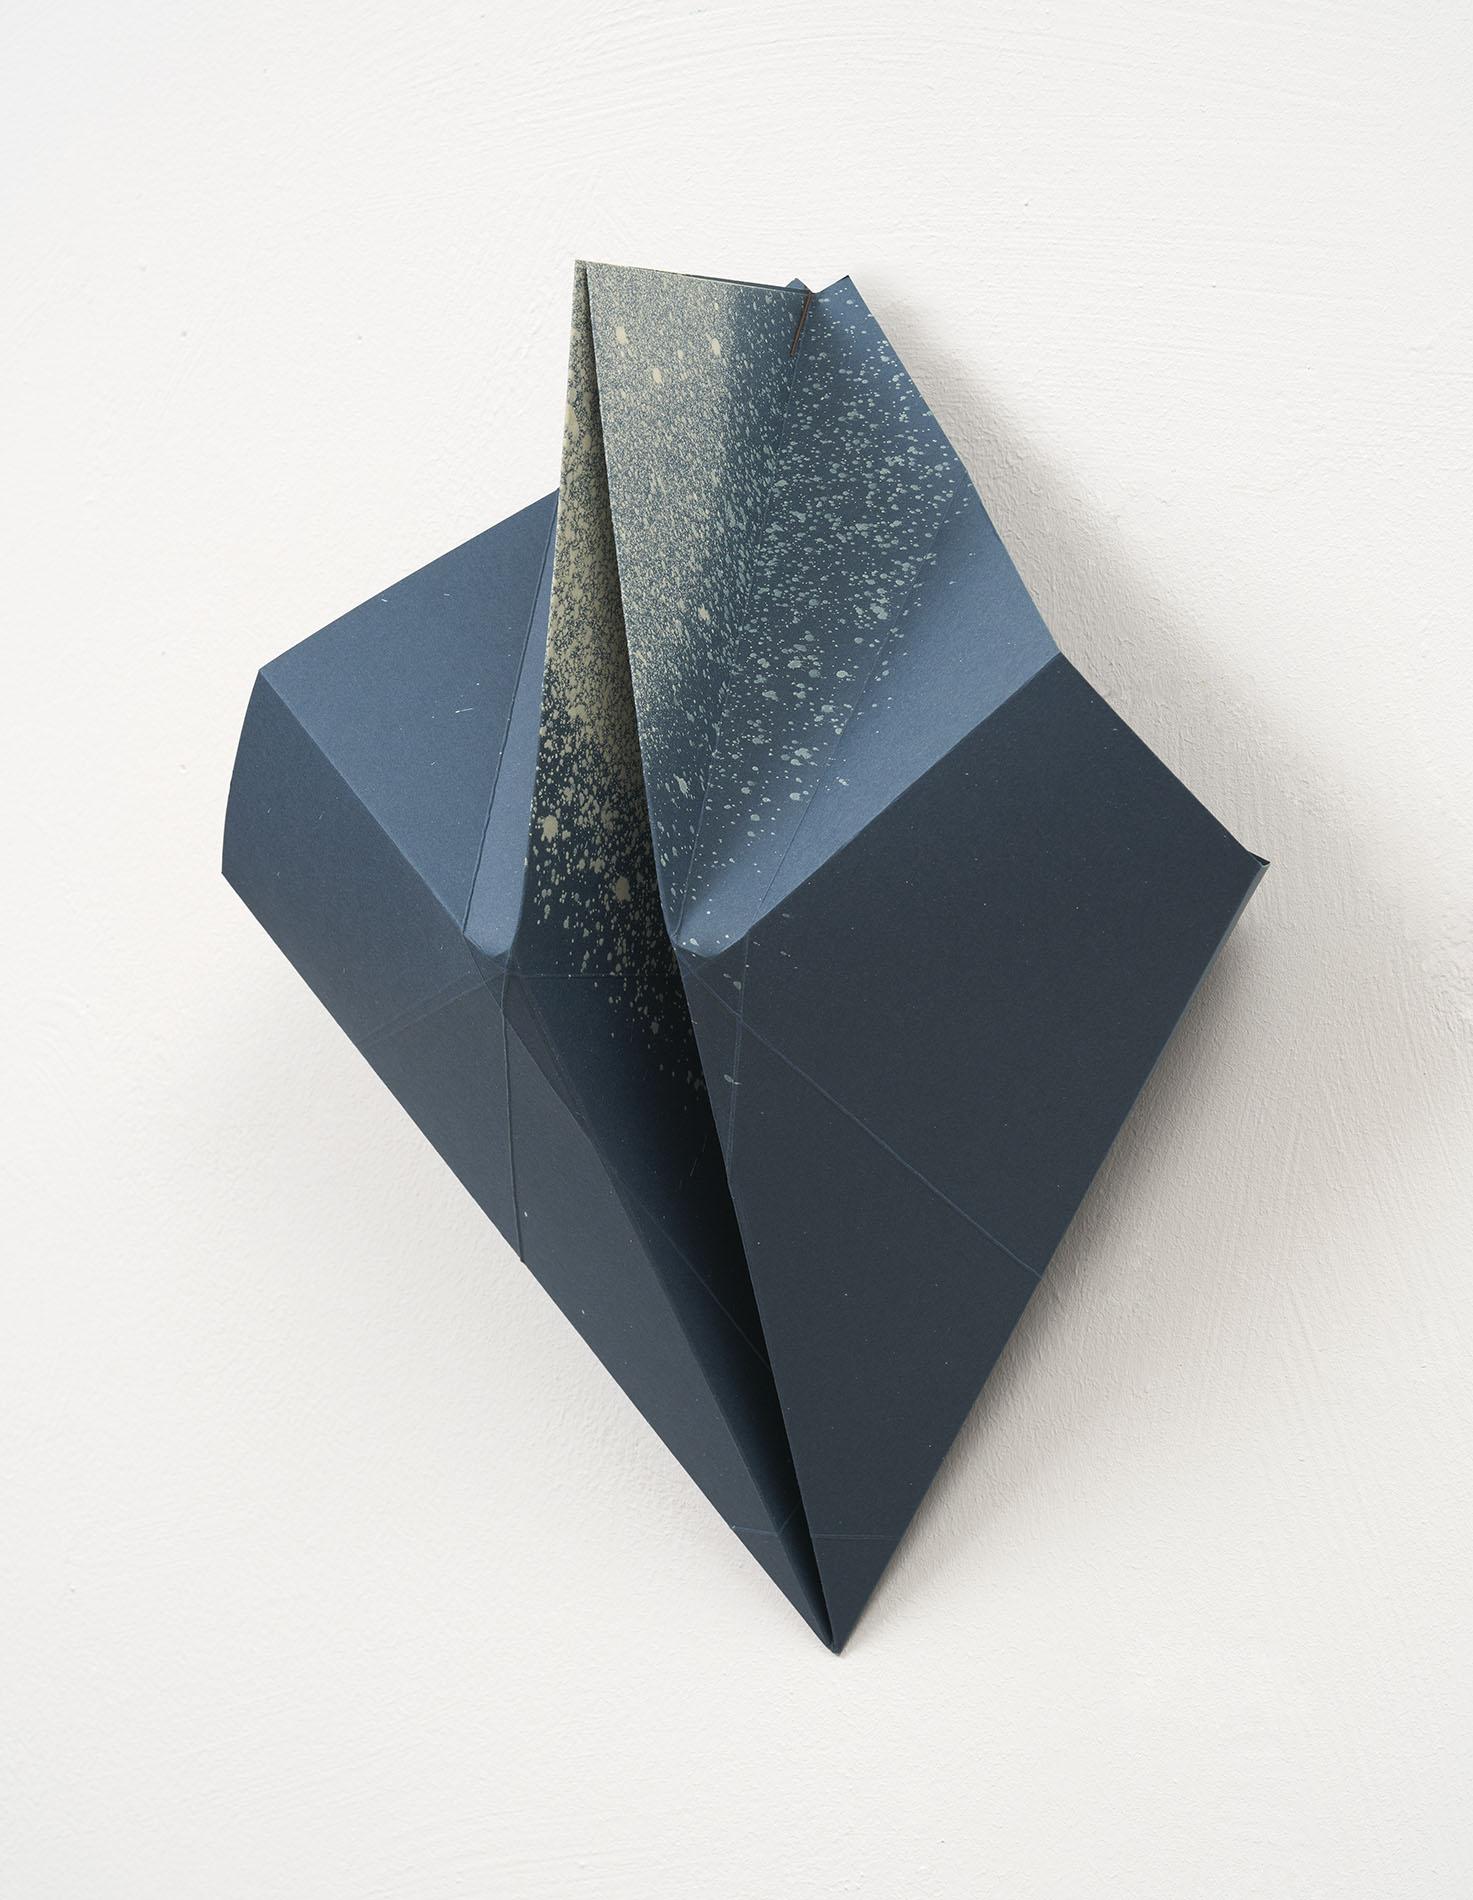 Origami-Cursus-b-Angelika-J-Trojnarski